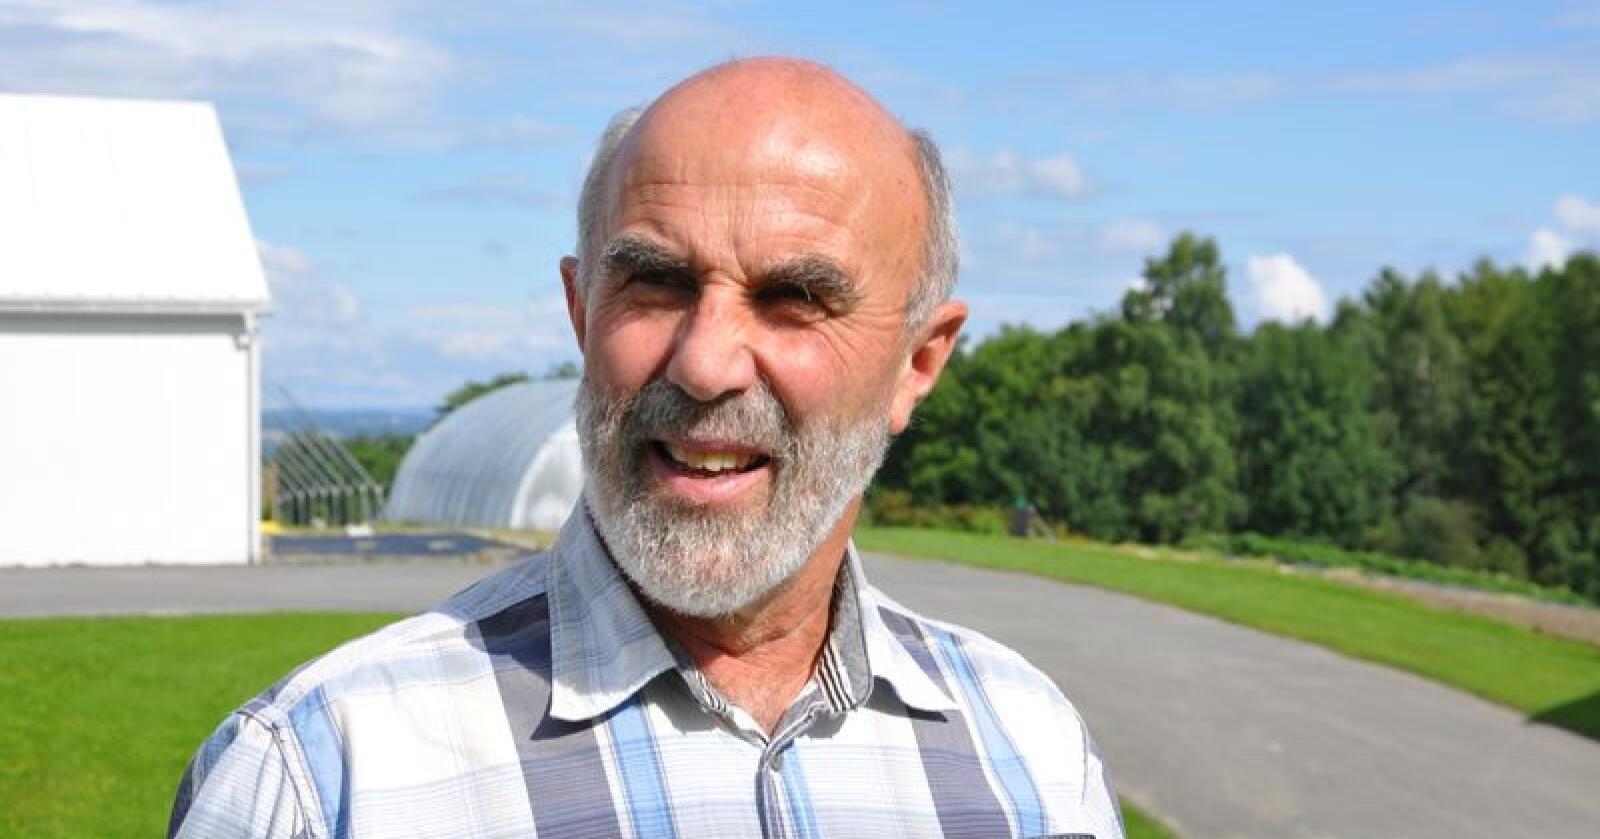 Jakob Bjerkem, tidlegare leiar i Oikos økologisk Norge. (Arkivfoto)